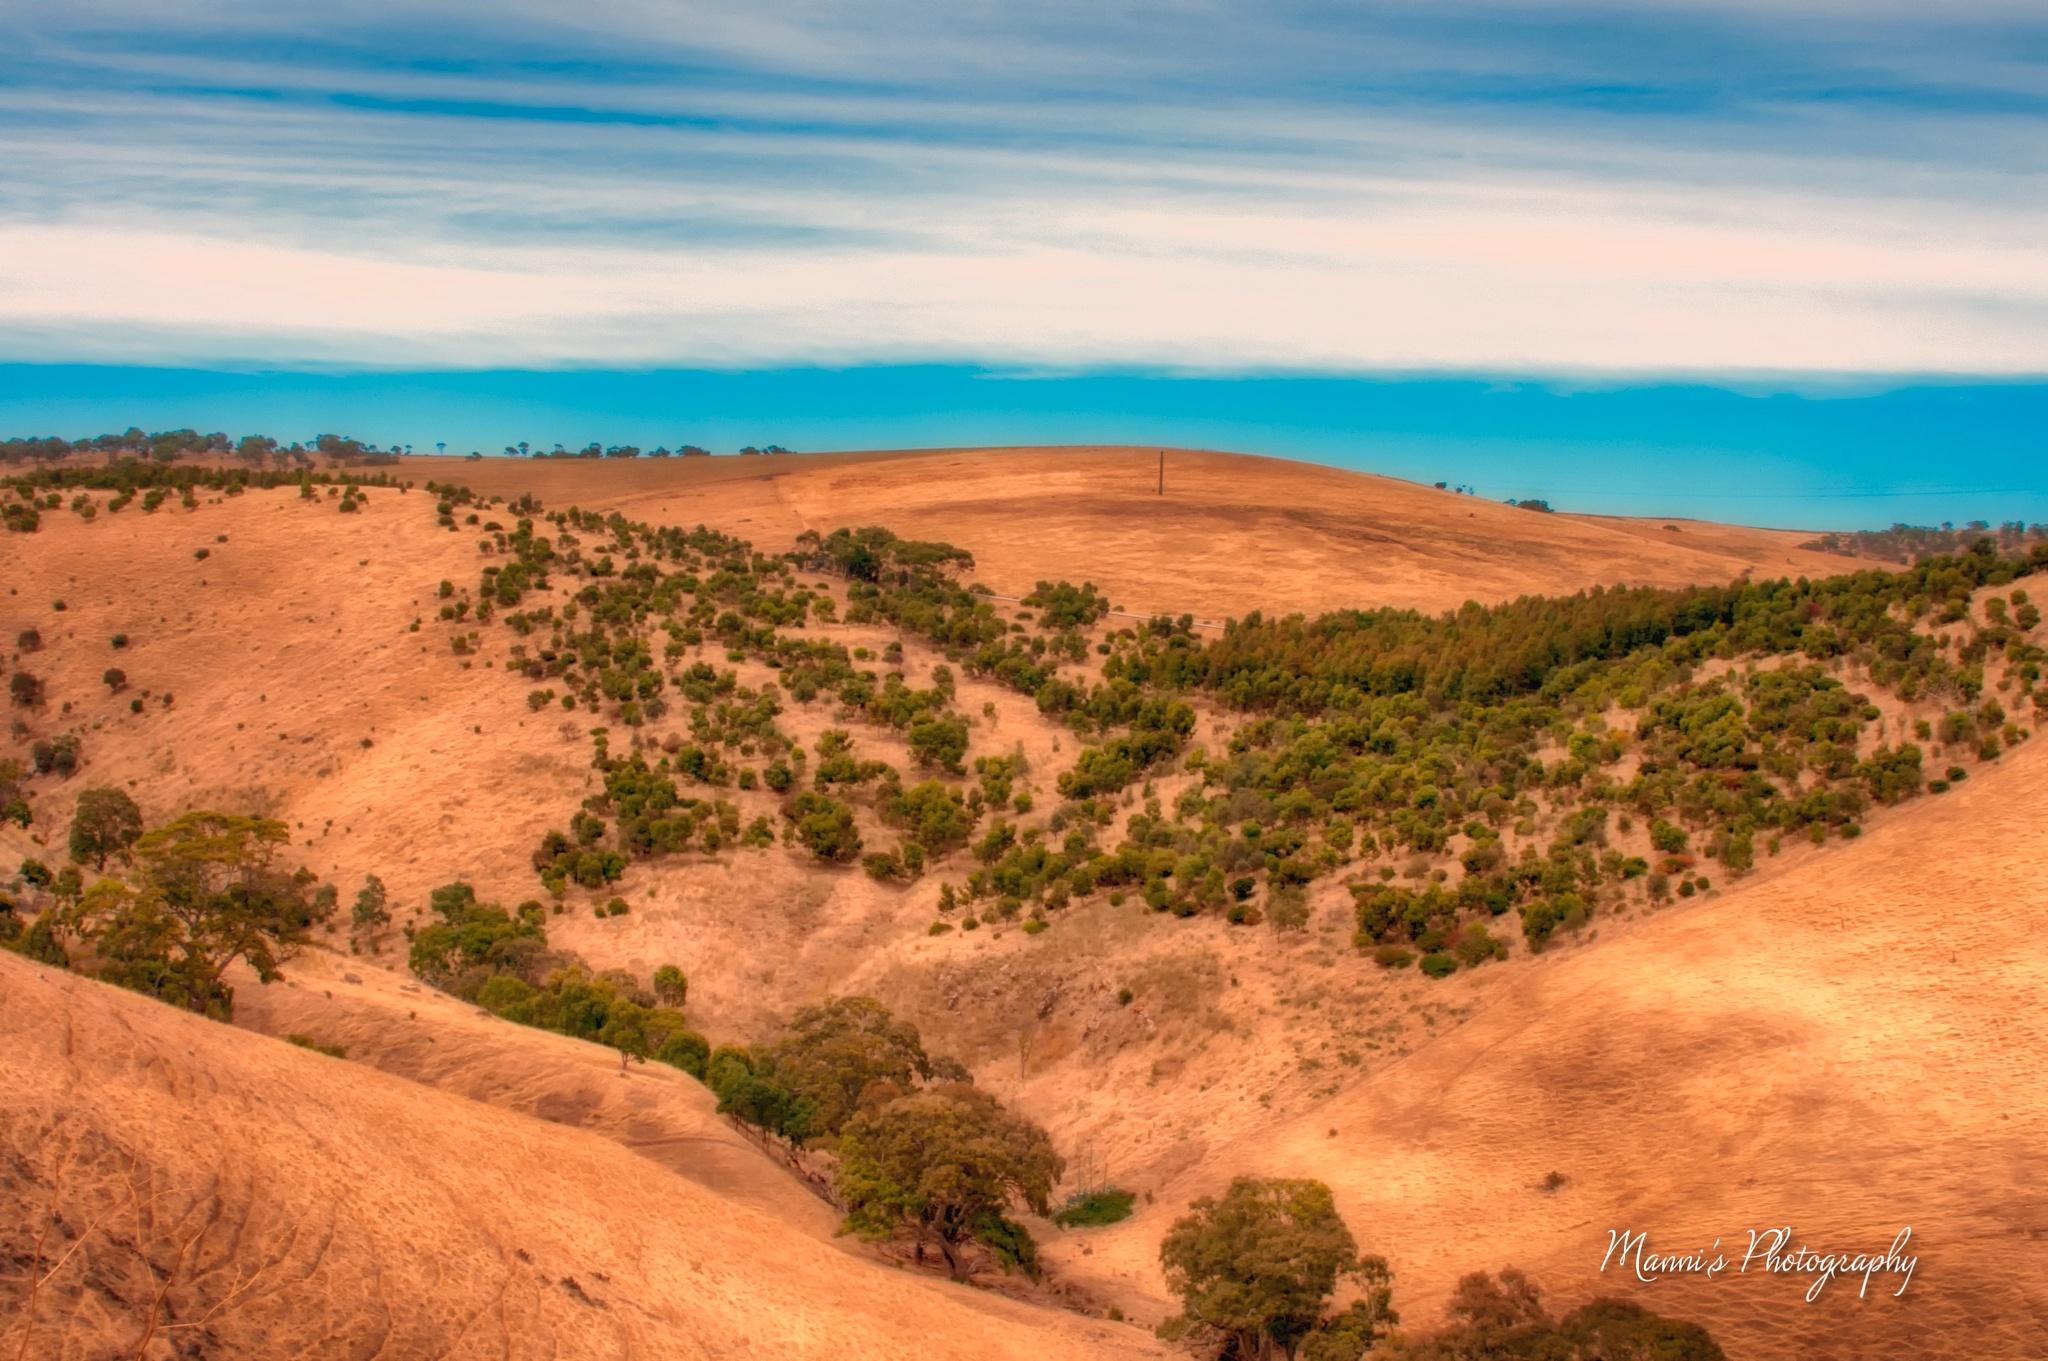 Landscape by Manni